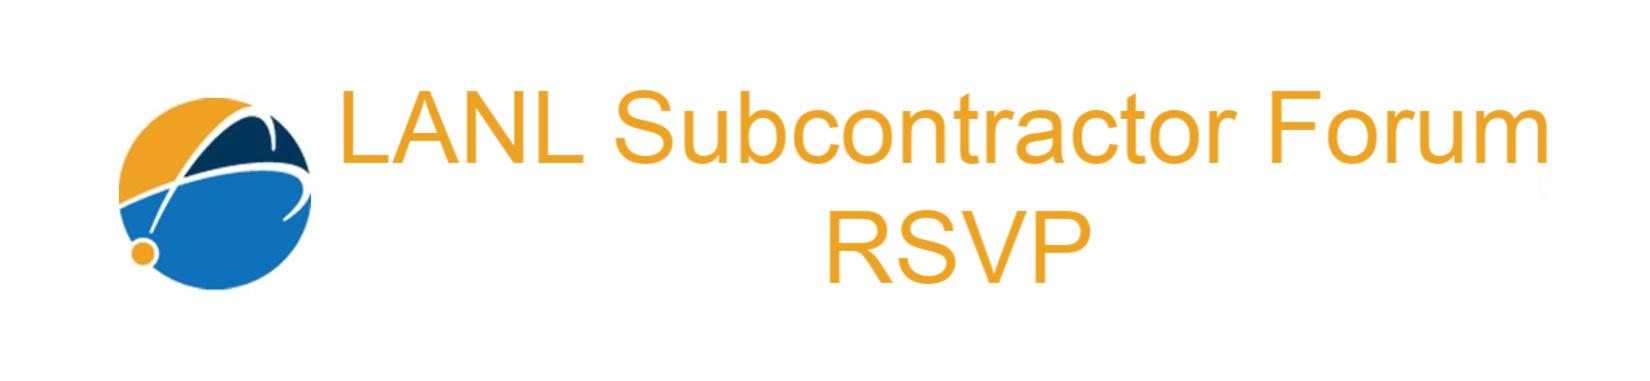 LANL Subcontractor Forum RSVP